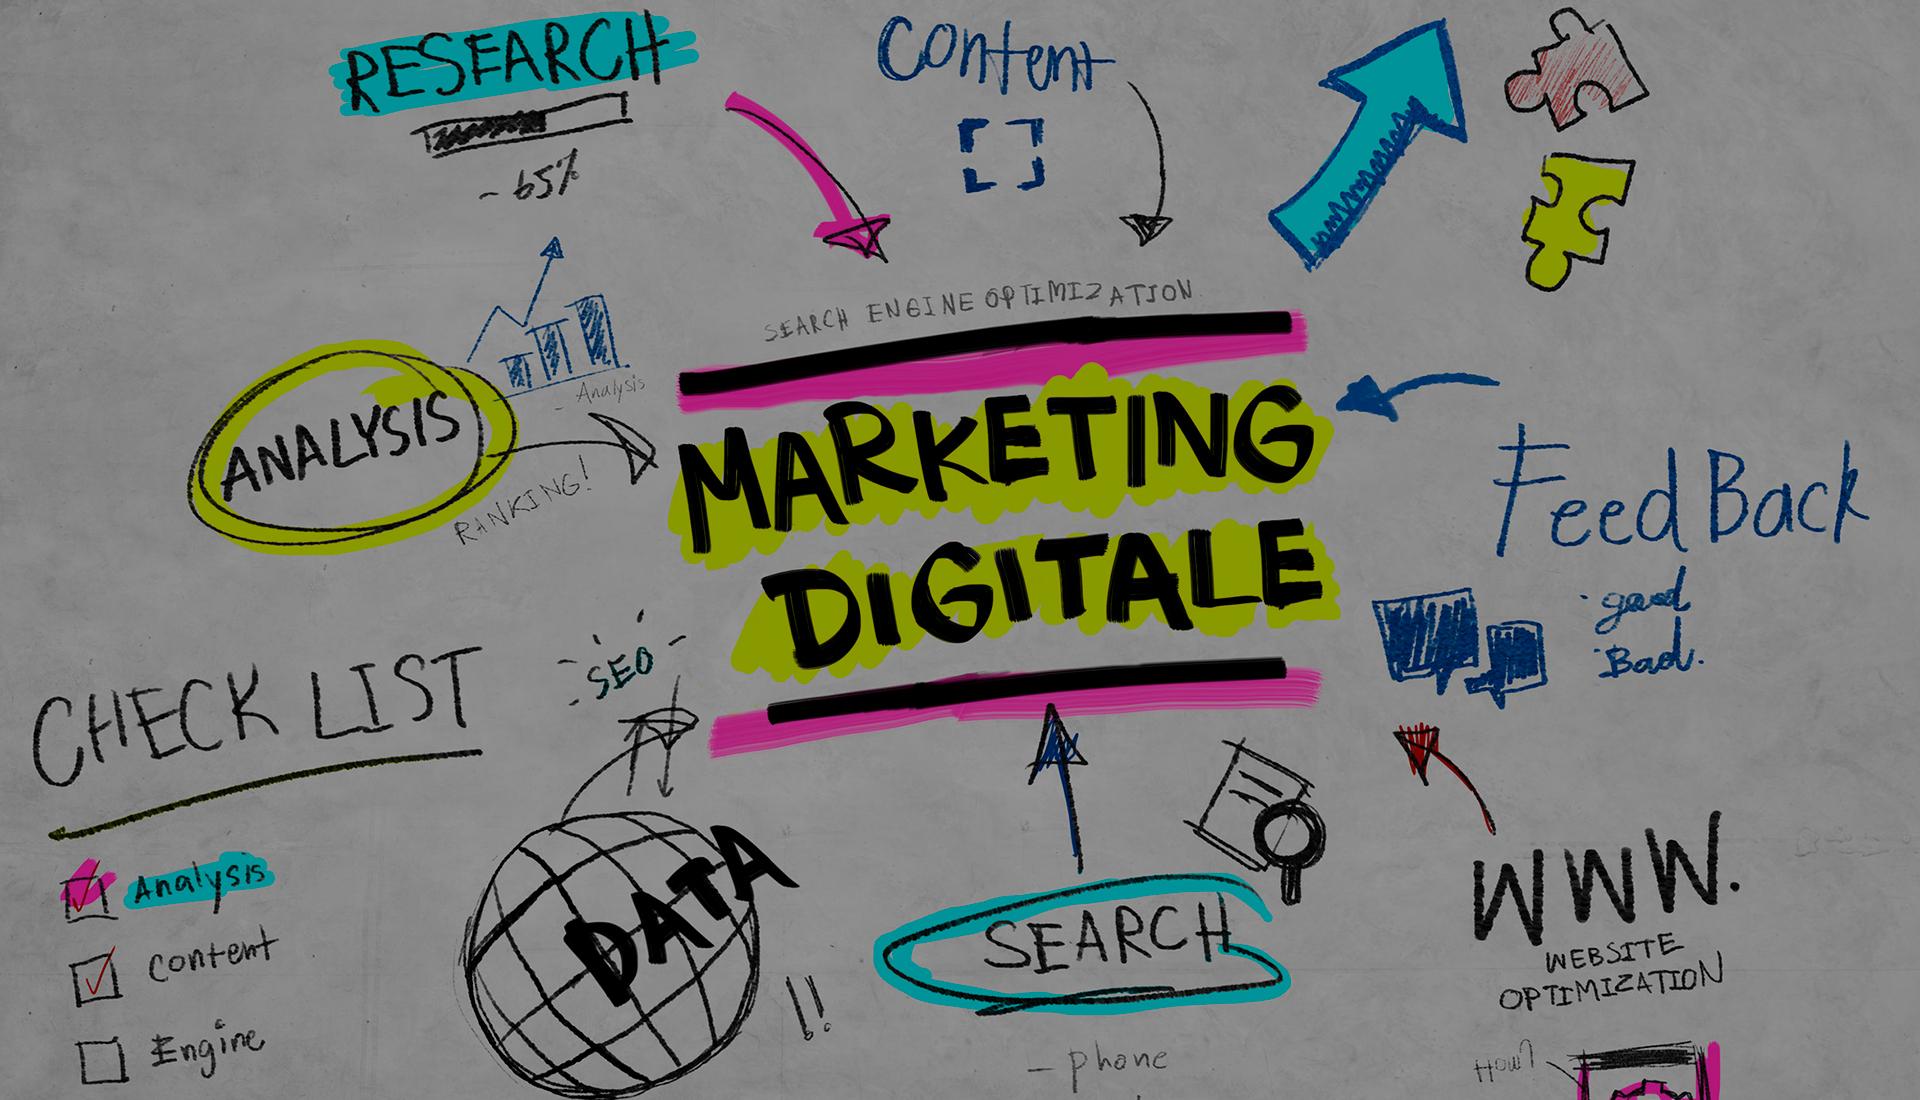 Marketing Digitale.